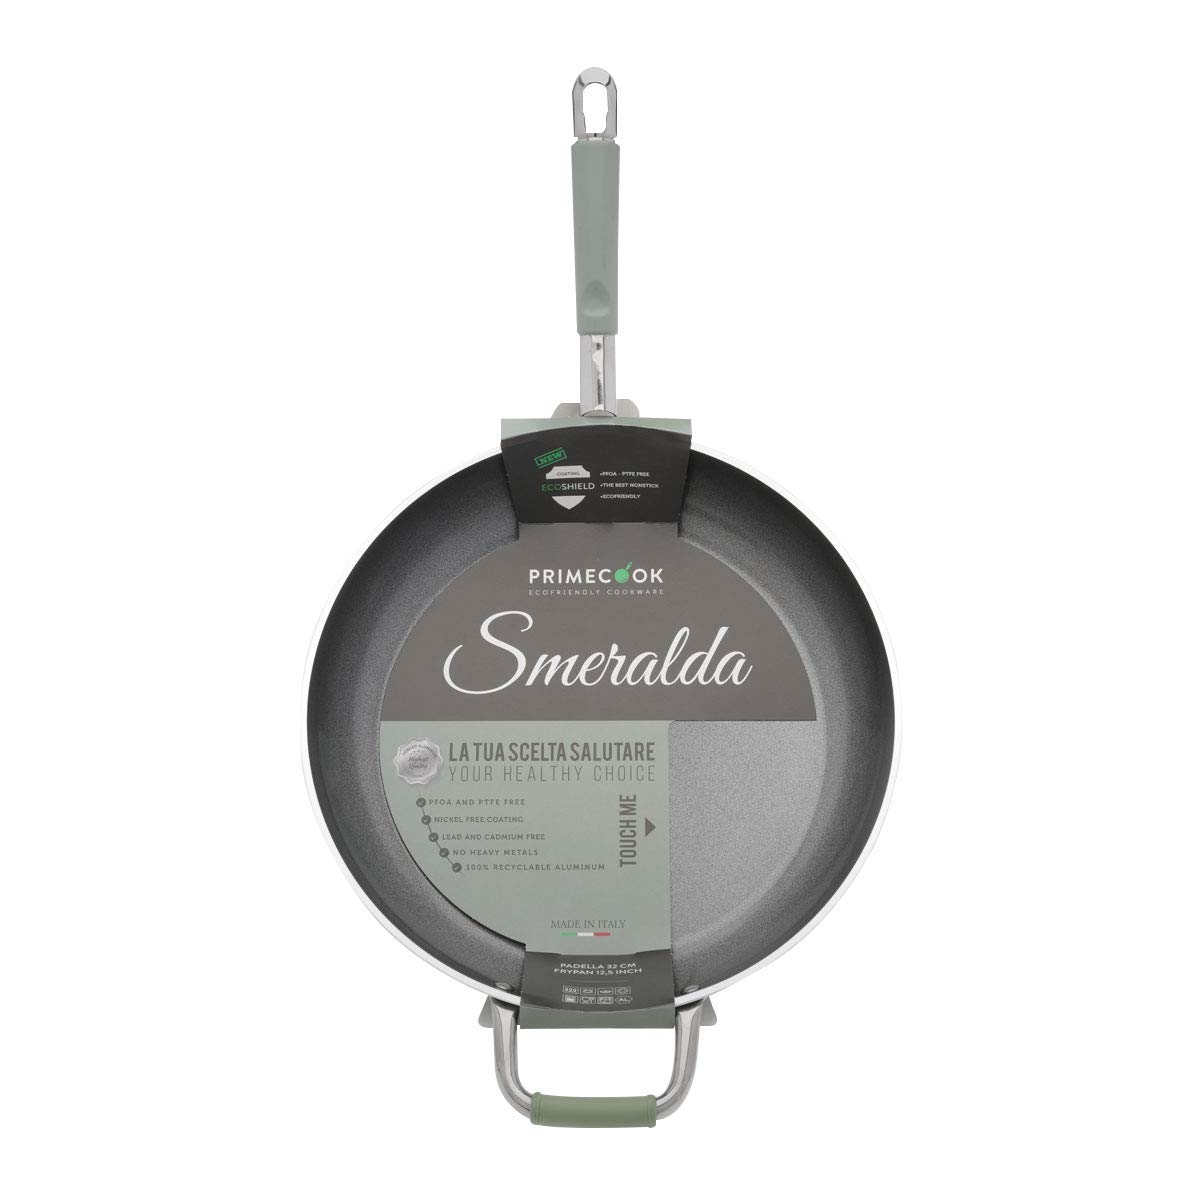 1904 Rivestimento ECOSHIELD Senza PTFE,PFOA e Nickel 100/% Made in Italy Primecook Casseruola Antiaderente Smeralda 20 Cm